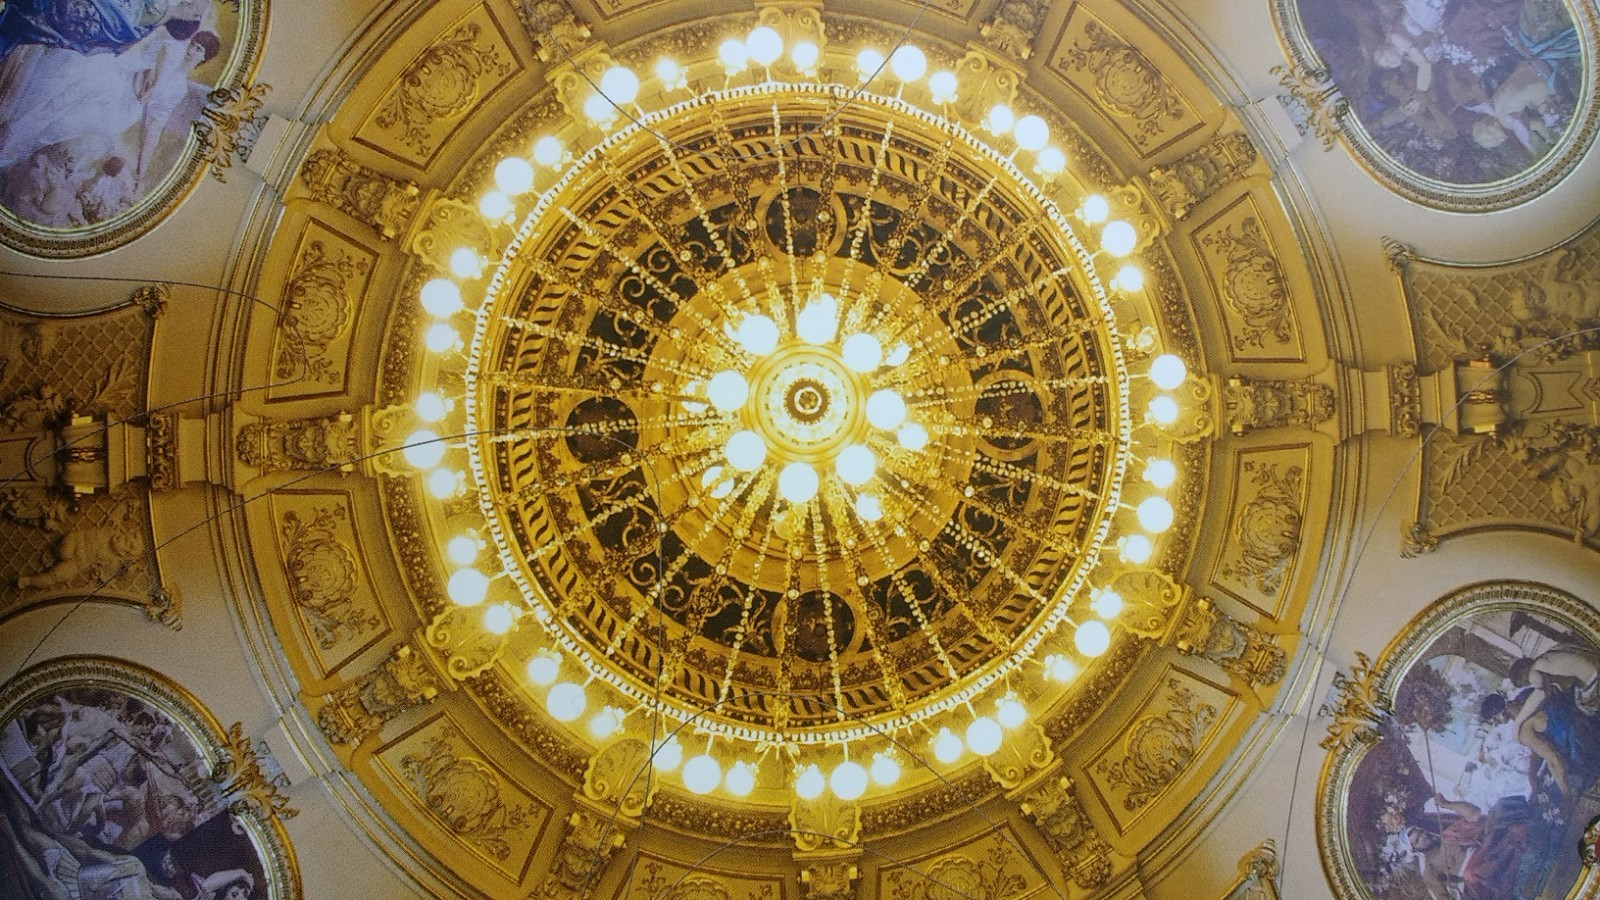 Gustav Klimt's Birthday, the Day Set for Opening the Exhibition